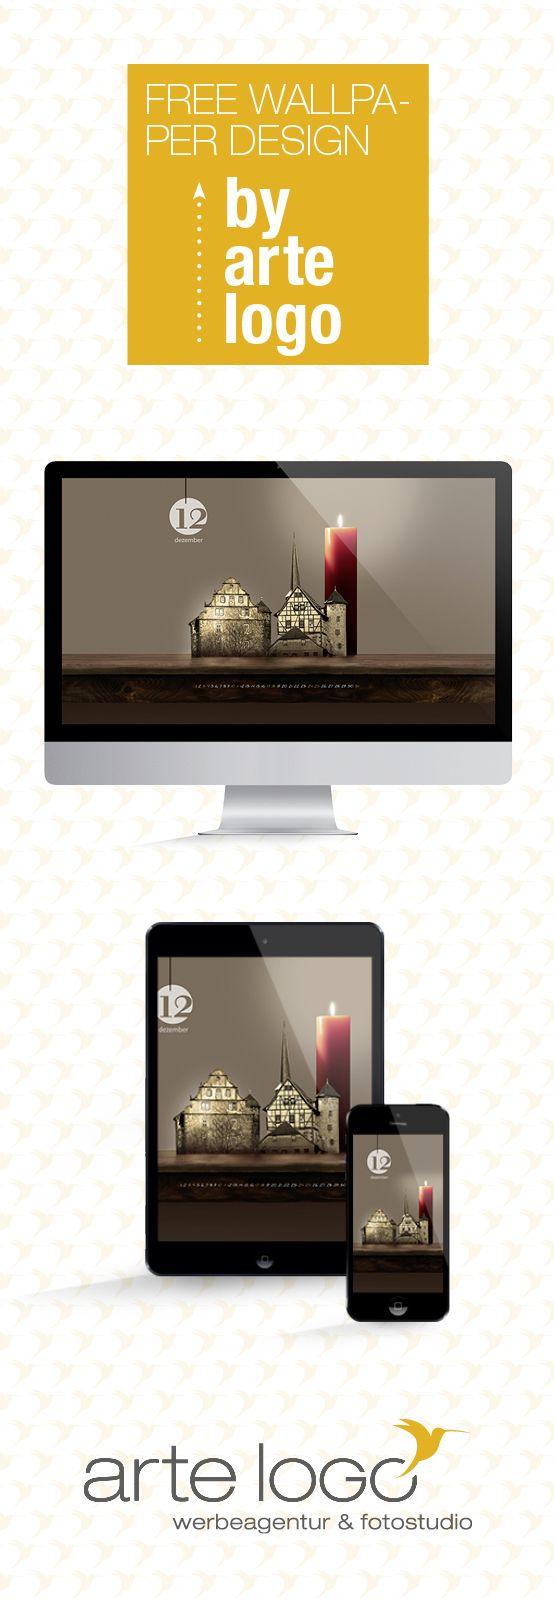 Free Wallpaper for Desktop, iPhone and iPad by arte-logo.de Free Download, Kalender 2016, selfmade, DIY, Dezember, Schlitz, Weihnachtskerze, Hinterturm, Größte Kerze der Welt, Burgenstadt, Fachwerk, Ringmauer, Weihnachtsmarkt, Vogelsbergkreis, Hessen